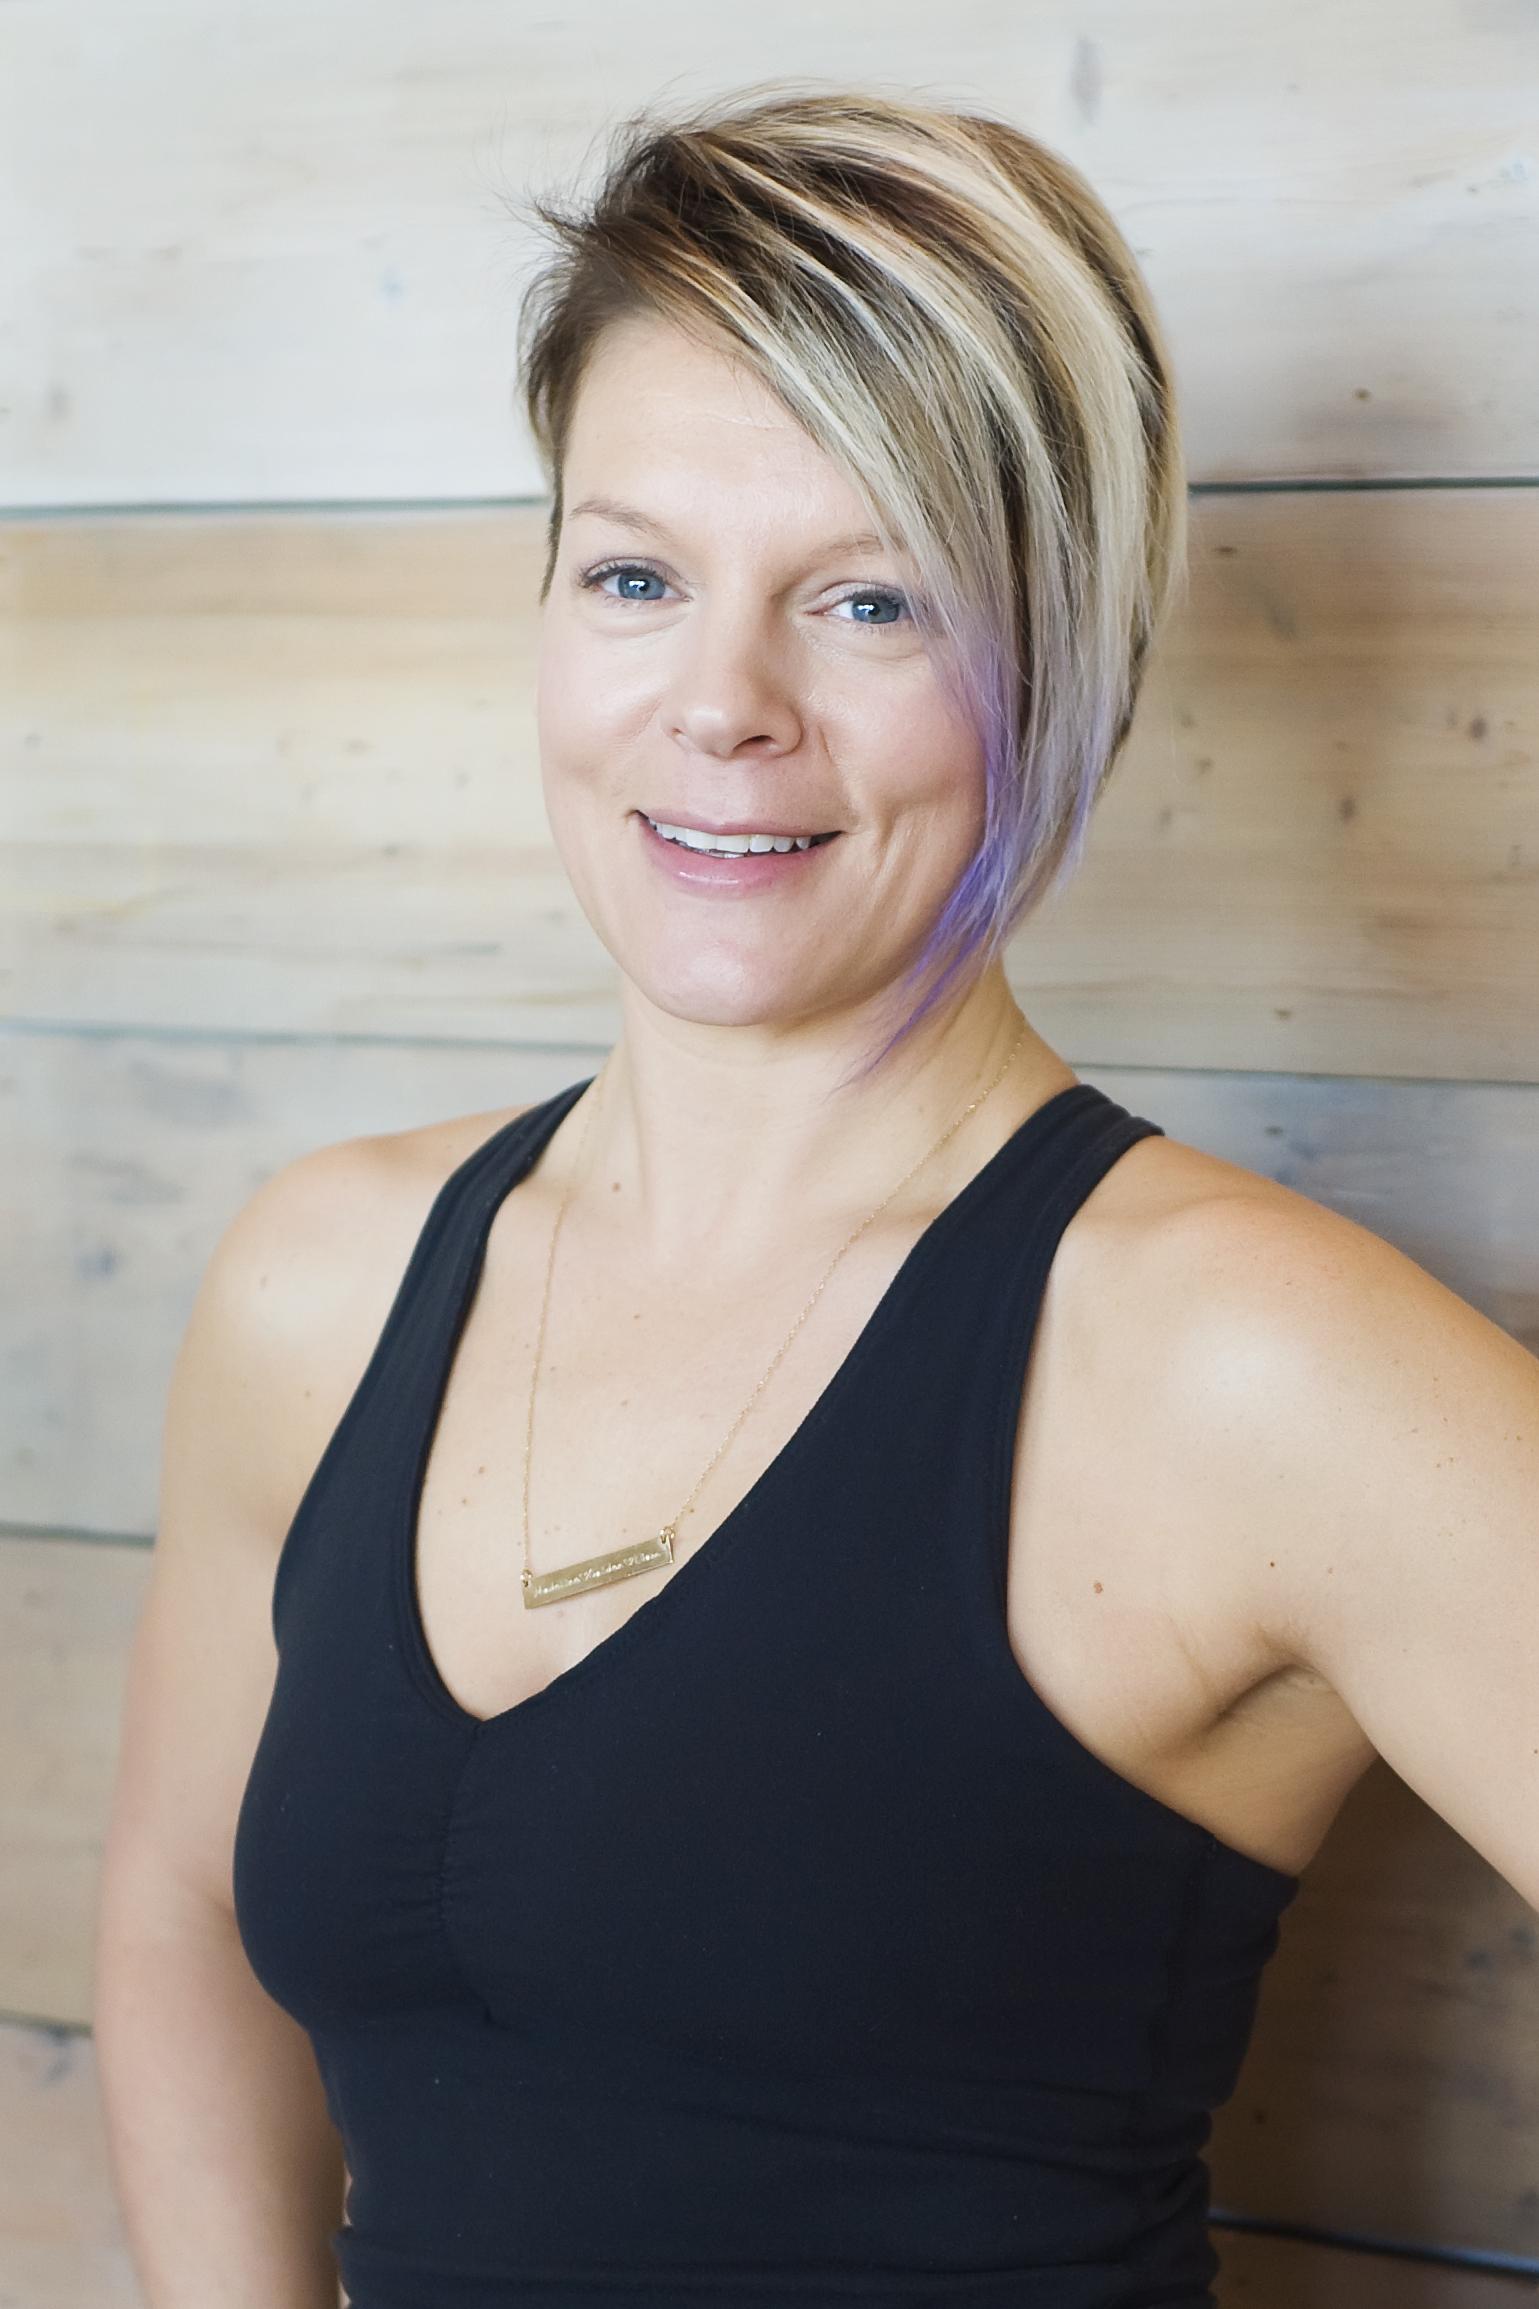 Megan Kearney